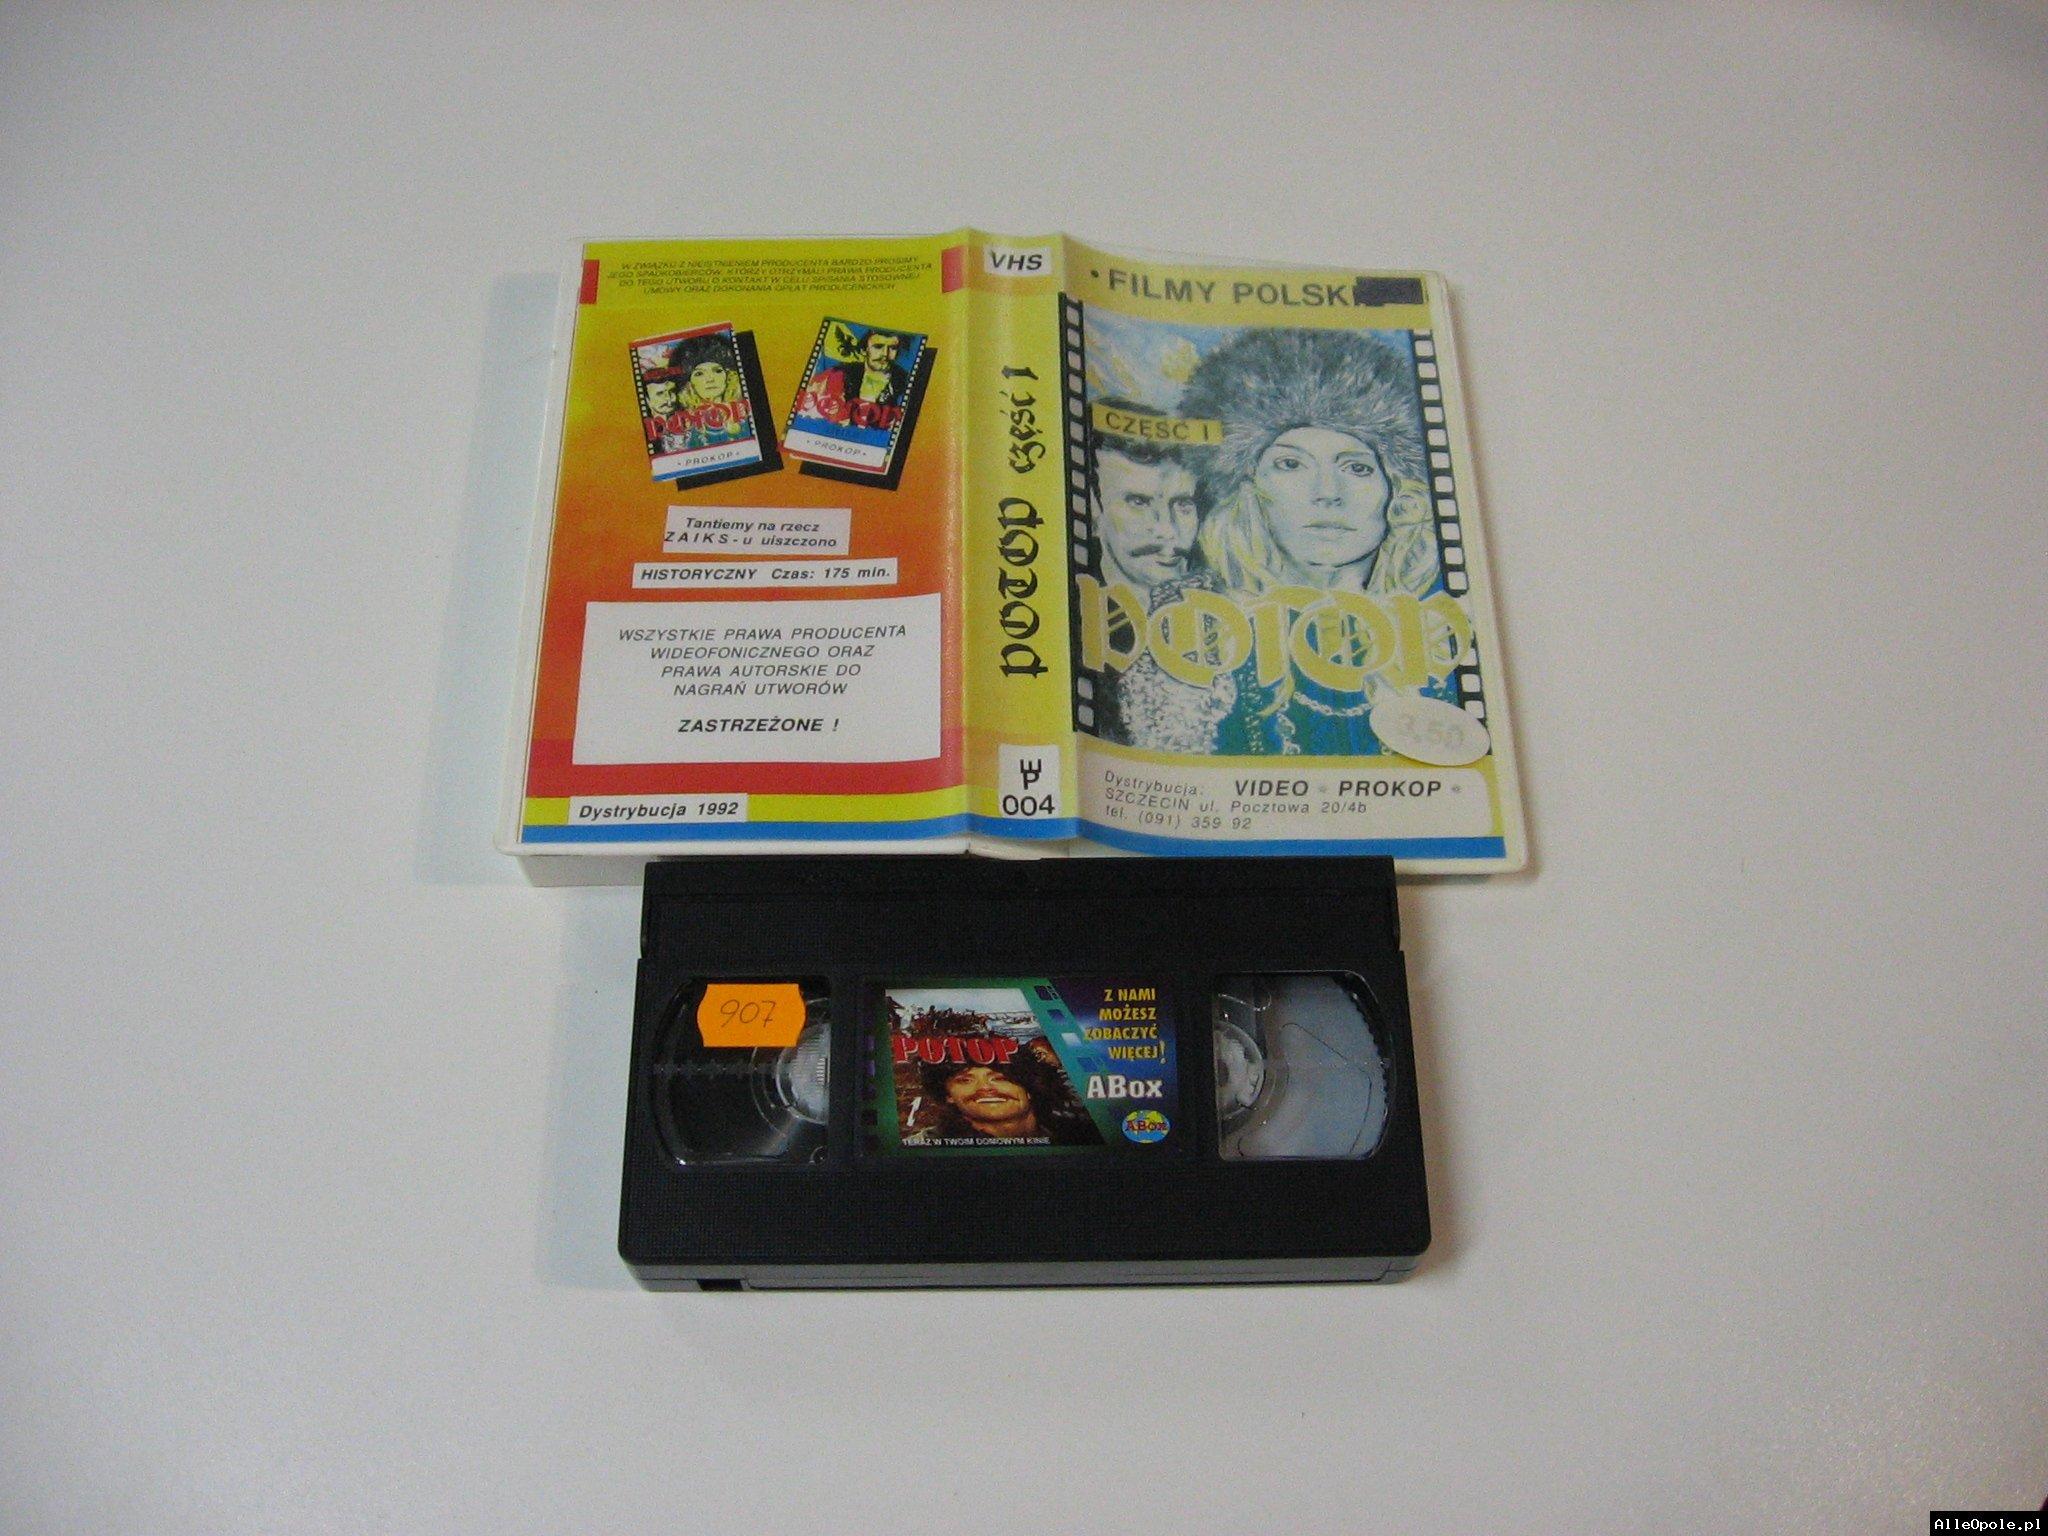 POTOP 1 - VHS Kaseta Video - Opole 1778